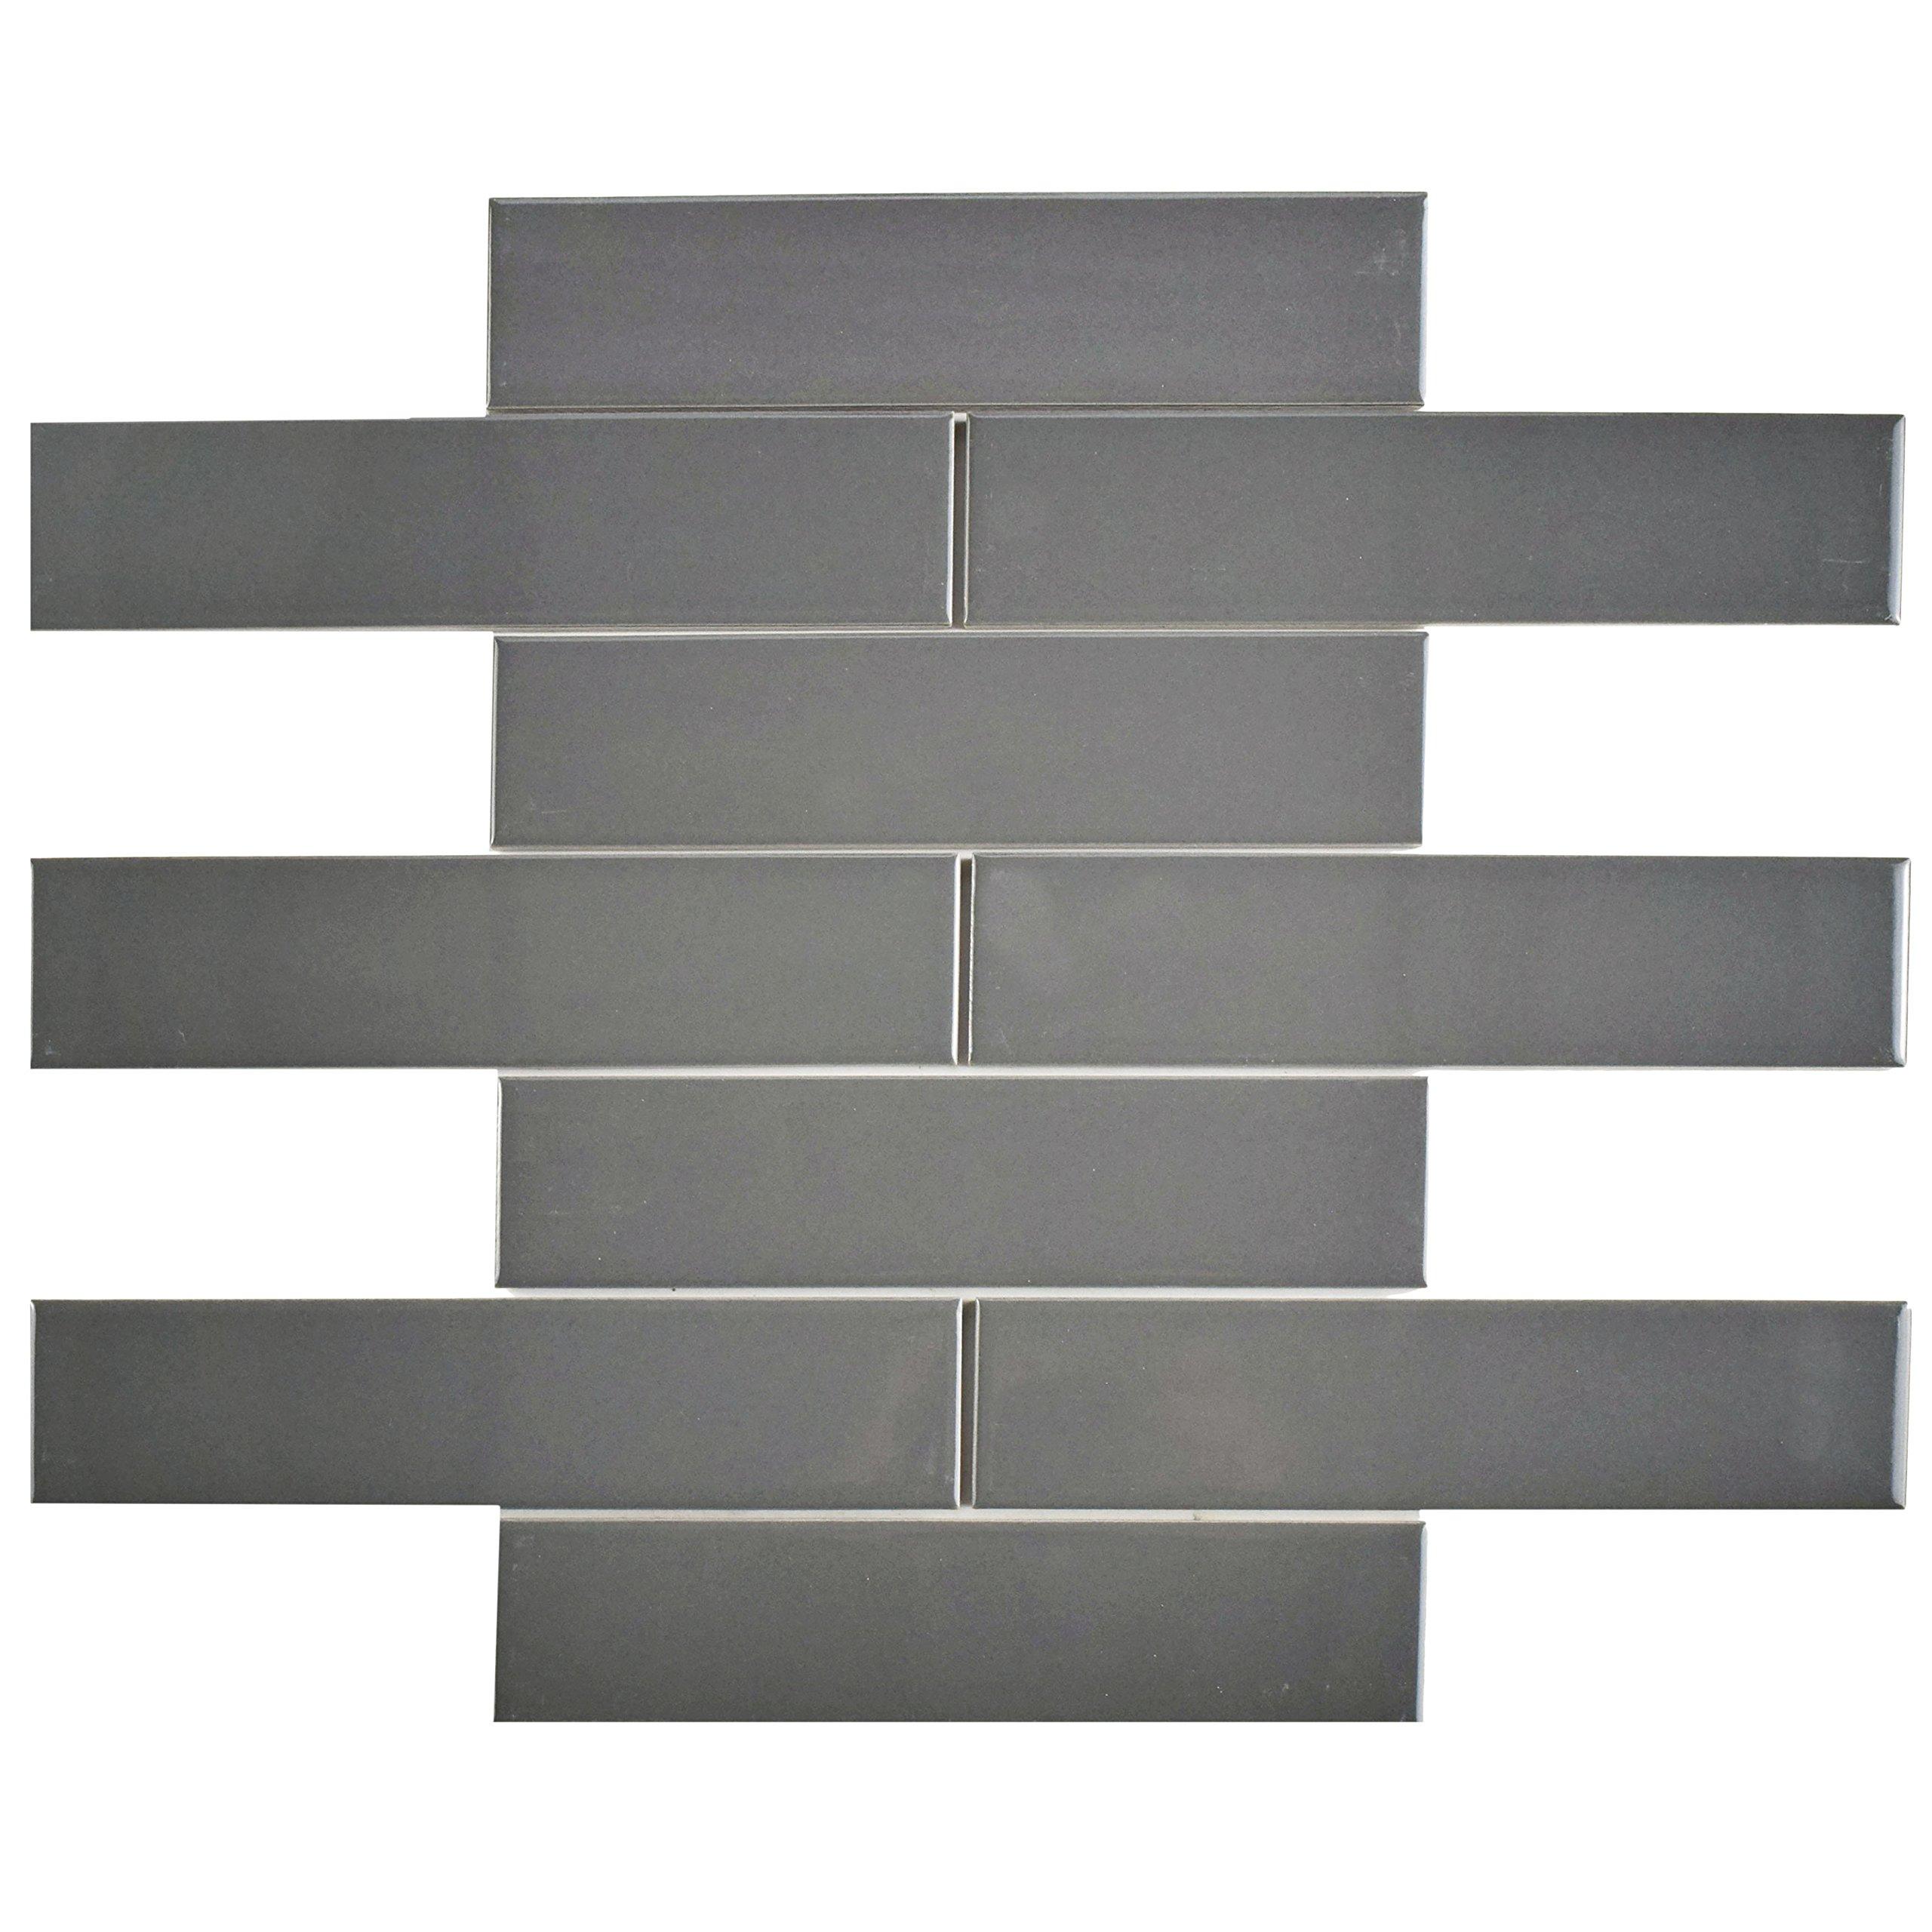 SomerTile FMTSHGG Retro Soho Subway Porcelain Floor and Wall Tile, 1.75'' x 7.62'', Glossy Grey